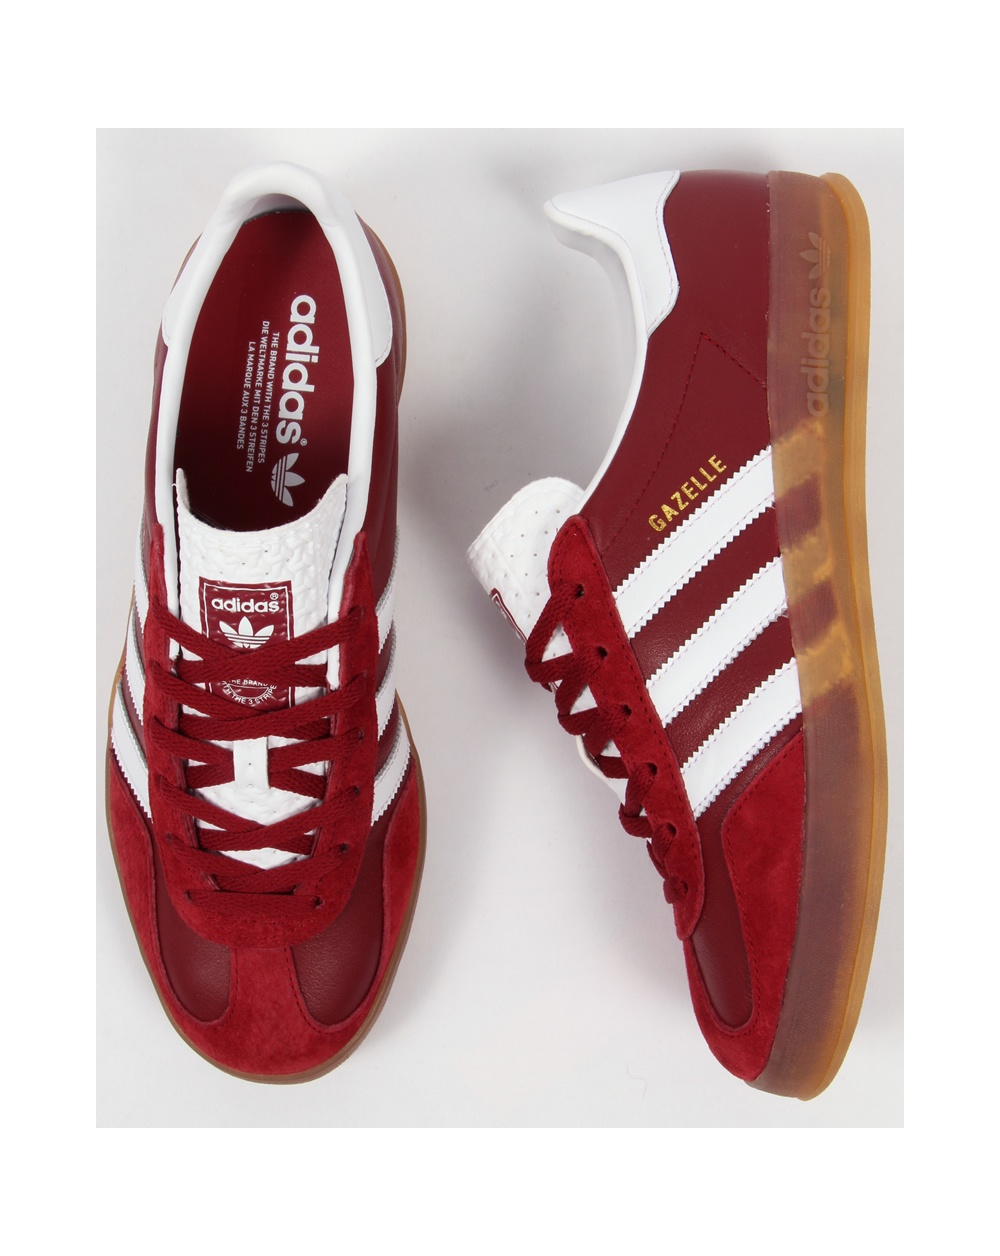 Adidas gazzella indoor formatori ruggine rosso / bianco, originali, Uomo